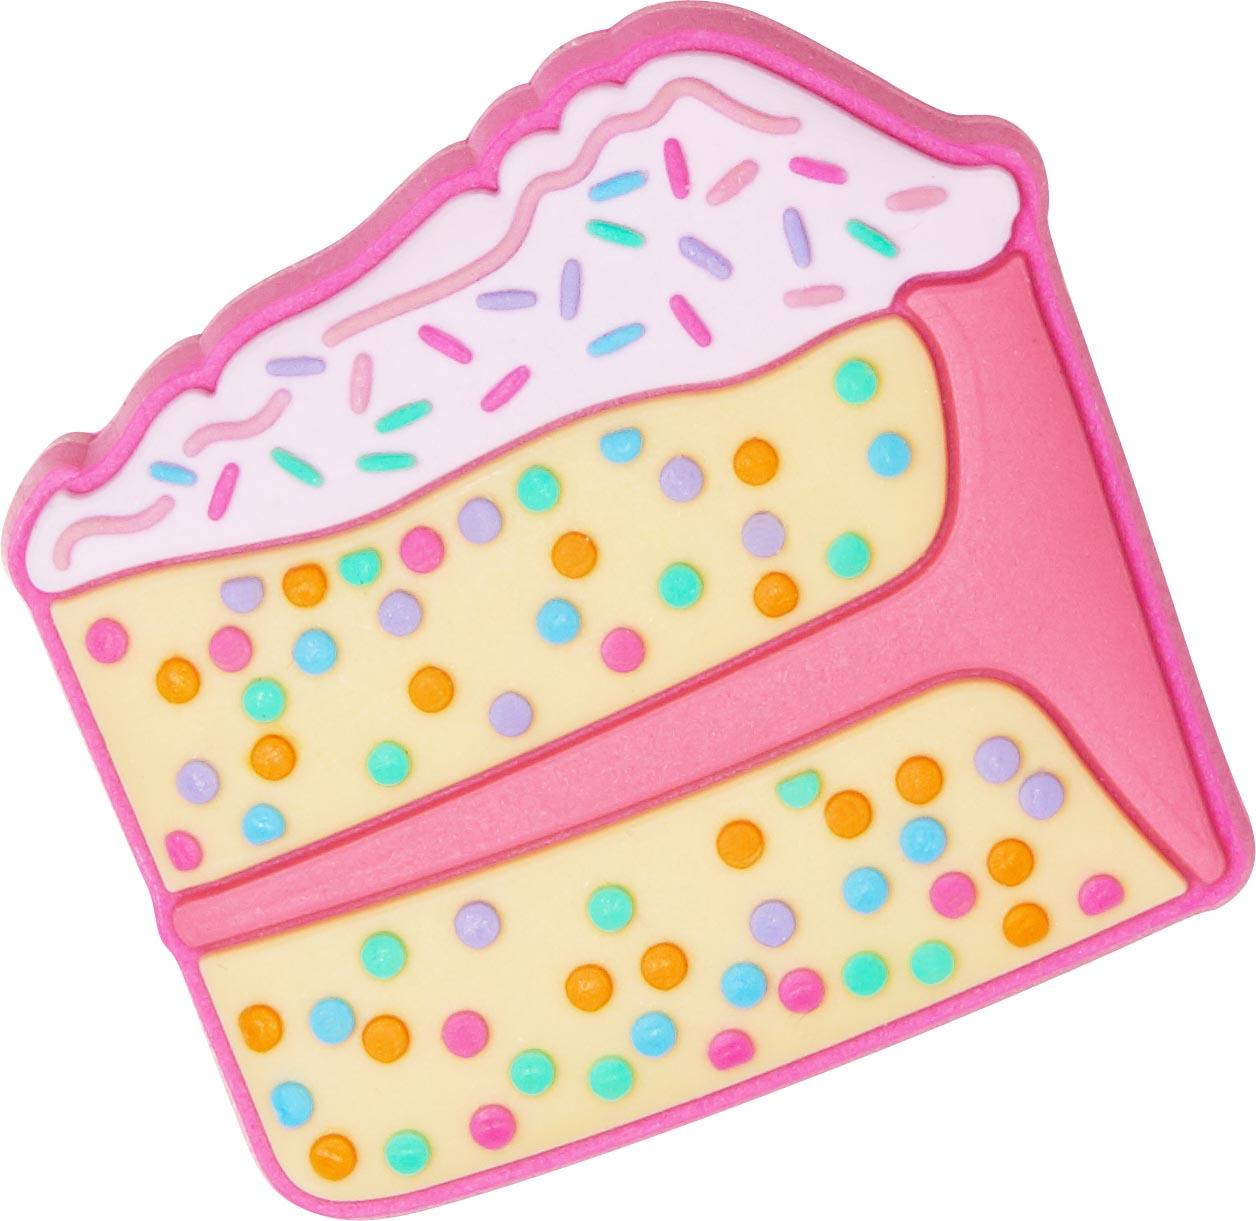 Crocs™ Crocs SPRINKLE CAKE G0691000-MU